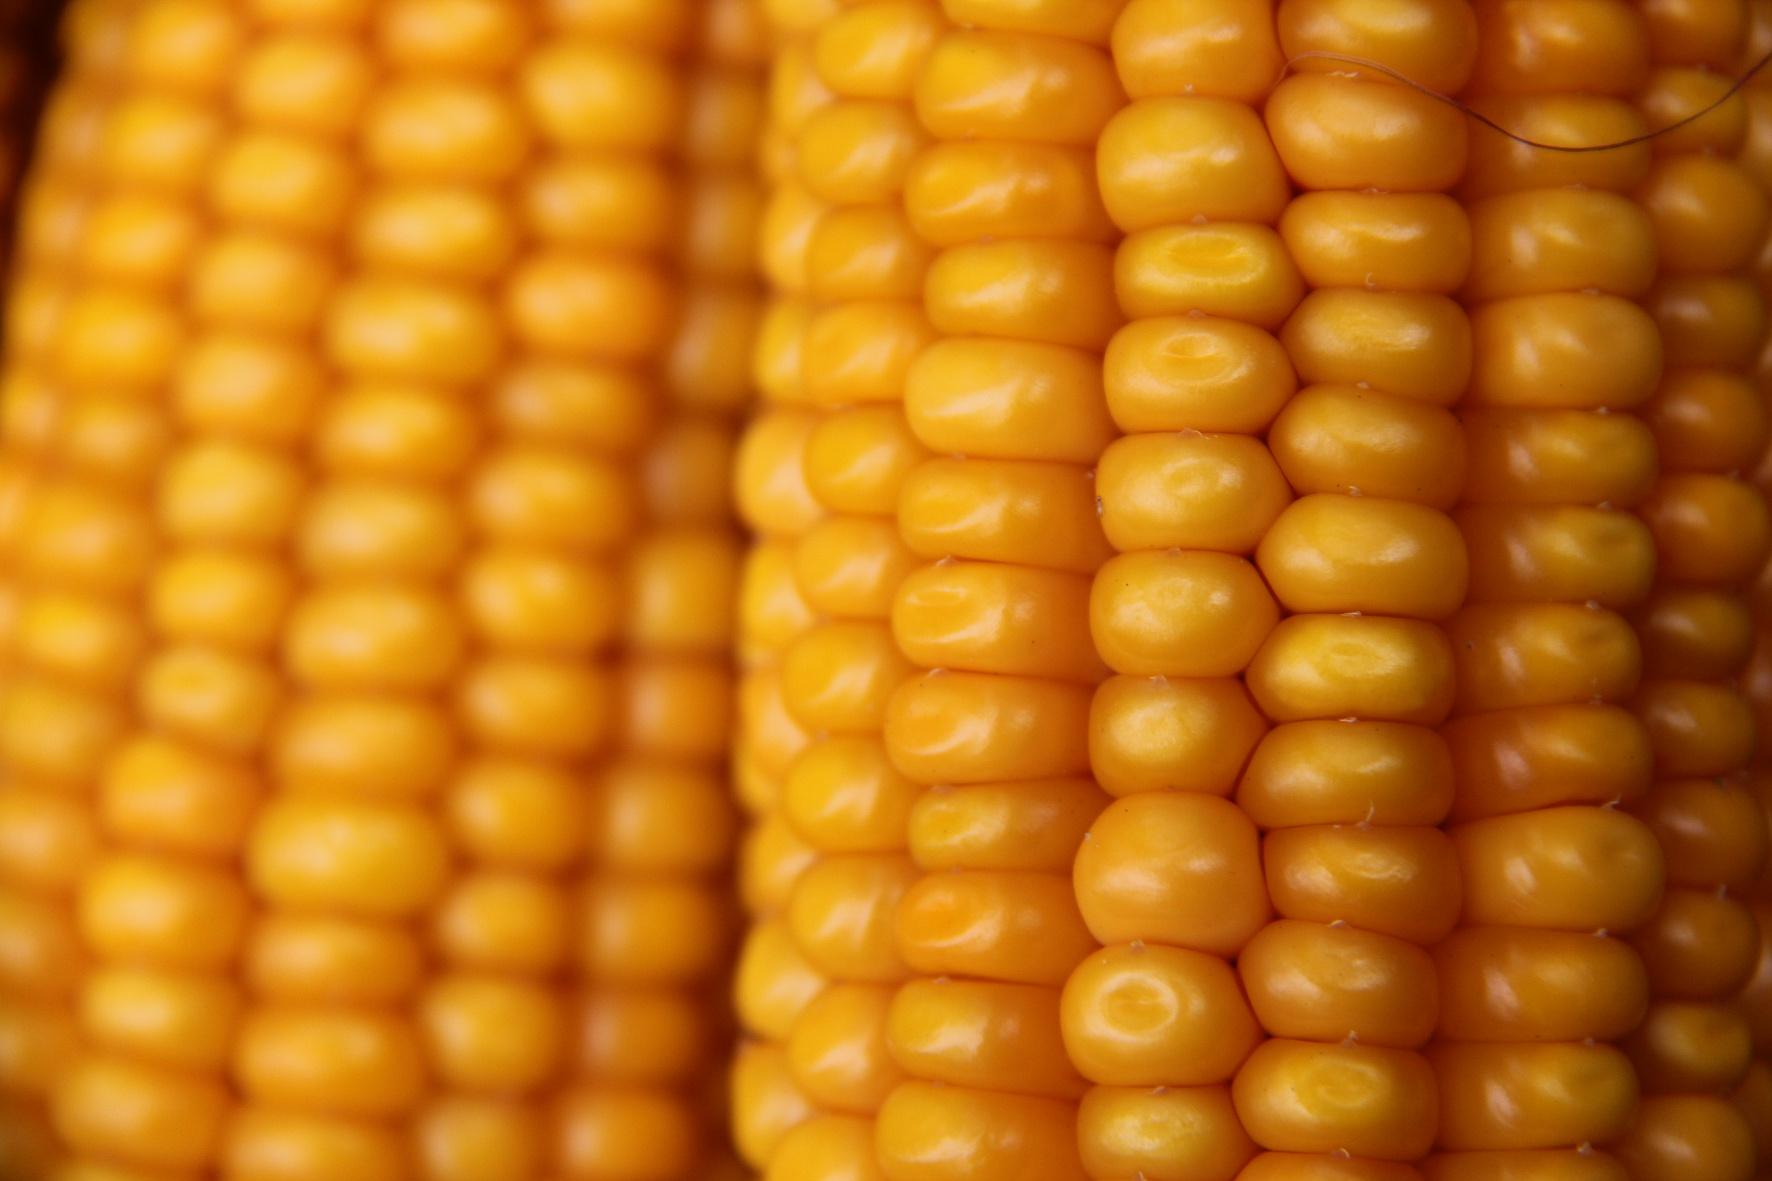 Unsere Öko-Sorten - Mais